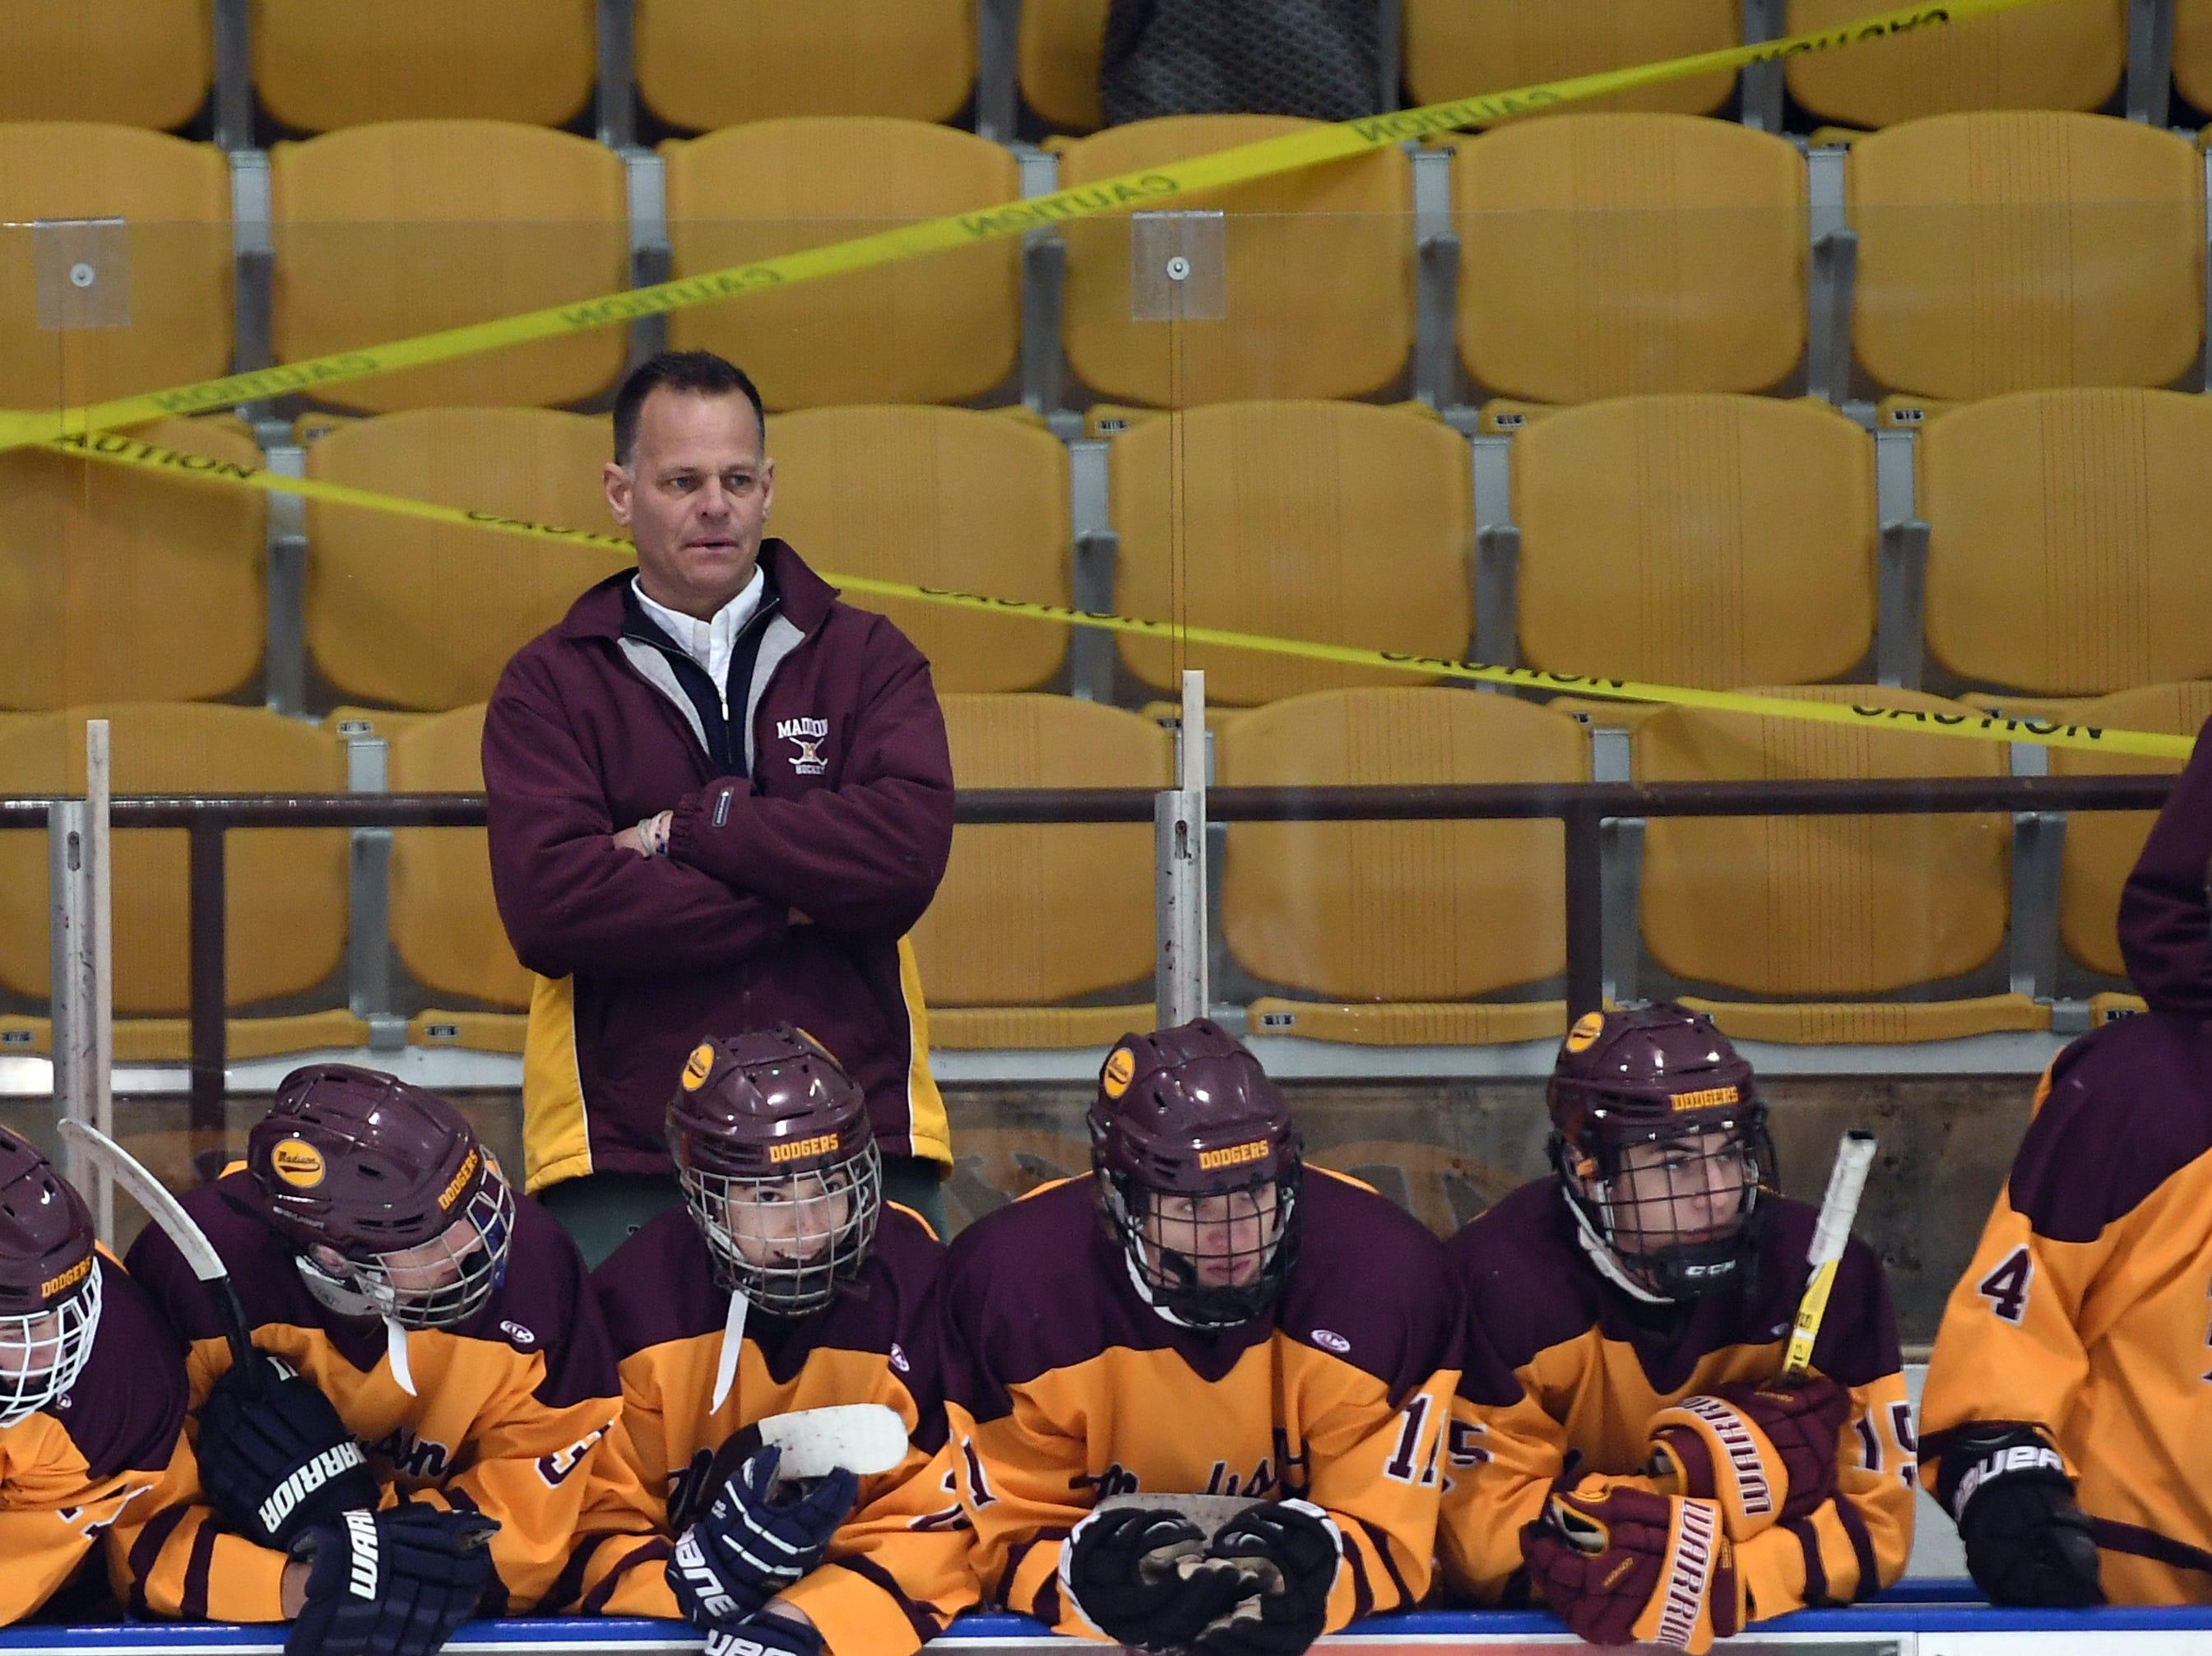 Madison ice hockey vs. Morristown-Beard at Mennen Sports Arena on Thursday, December 20, 2018. Dave Hansen, Madison coach.